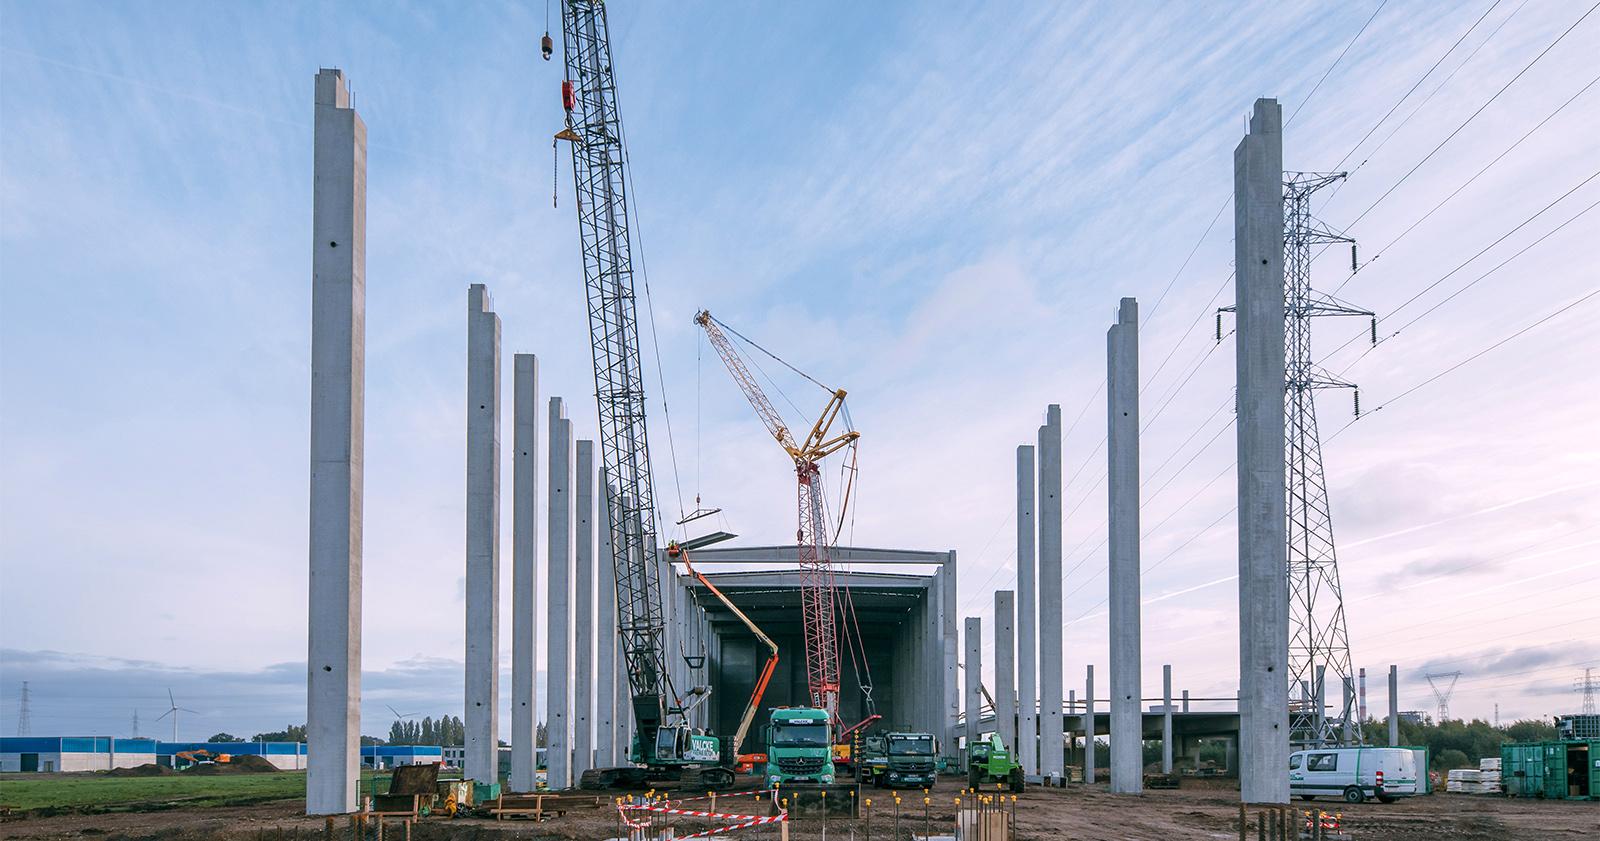 Seaport Brewing production facility, Evergem, Belgium